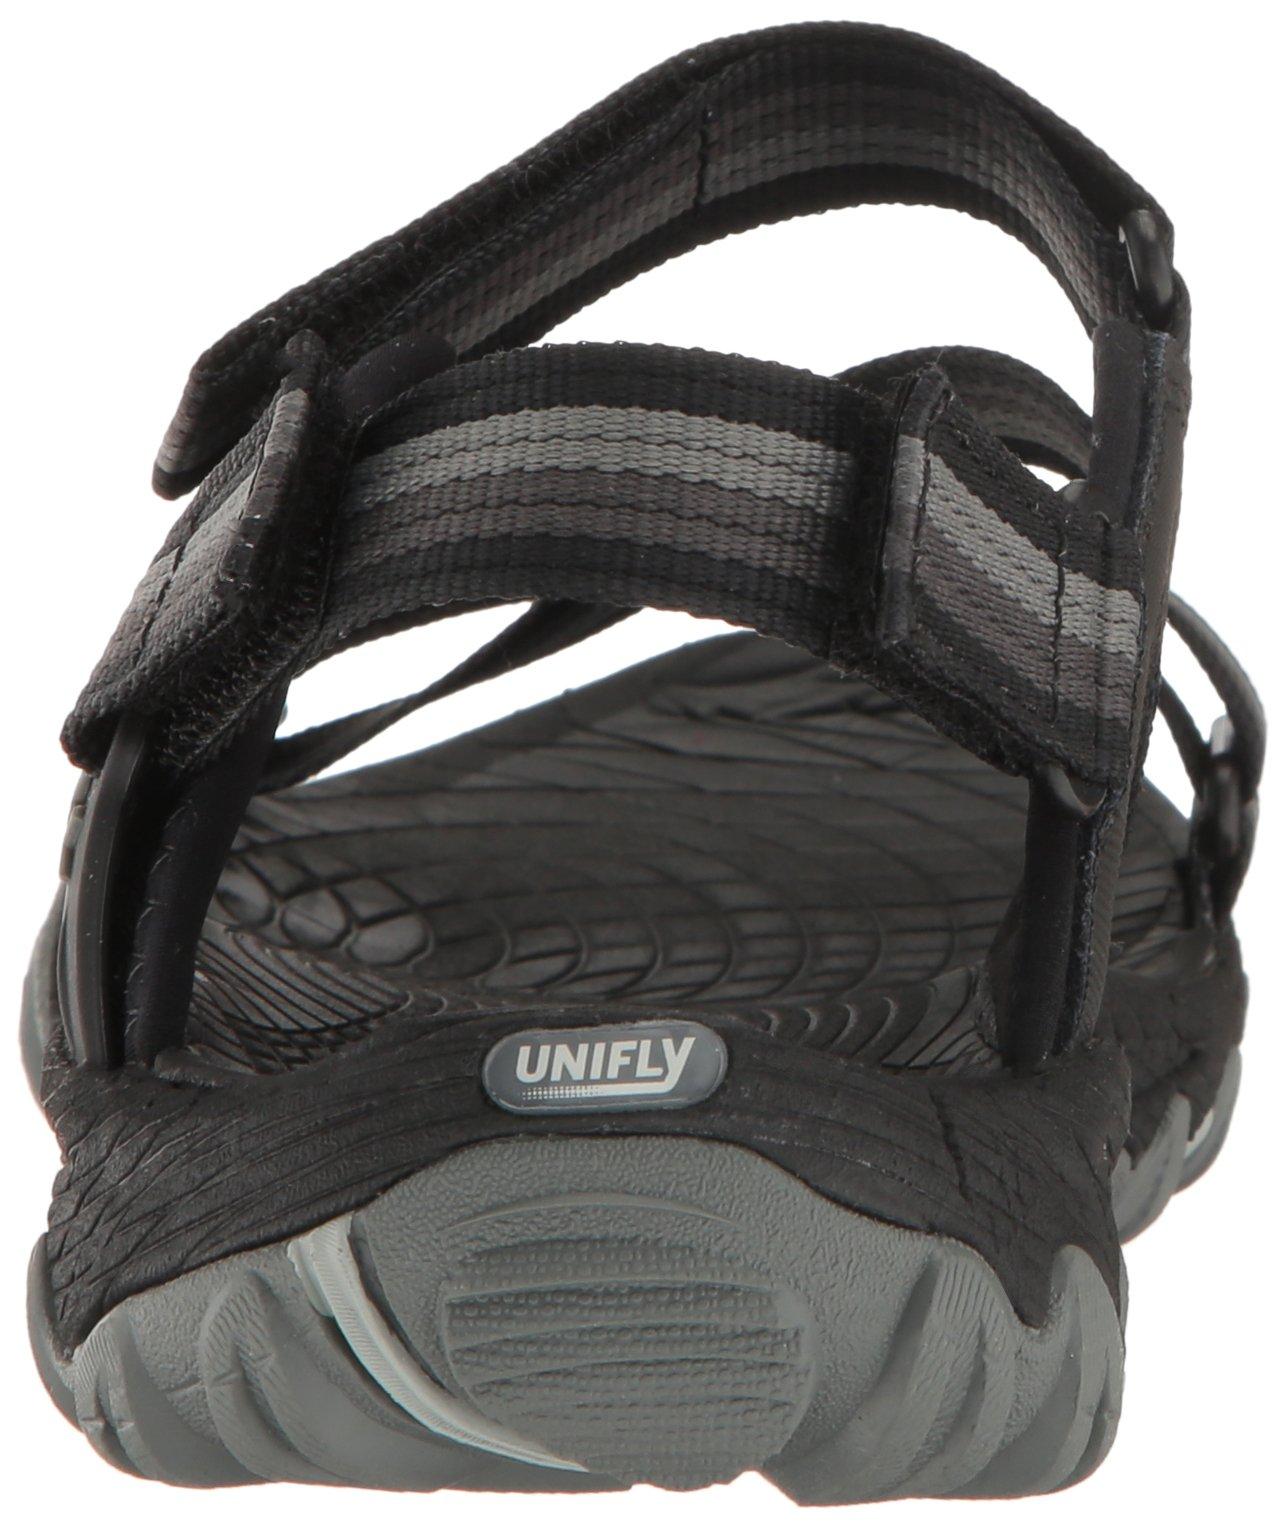 Merrell Women's All Out Blaze Web Sandal, Black, 9 M US by Merrell (Image #2)